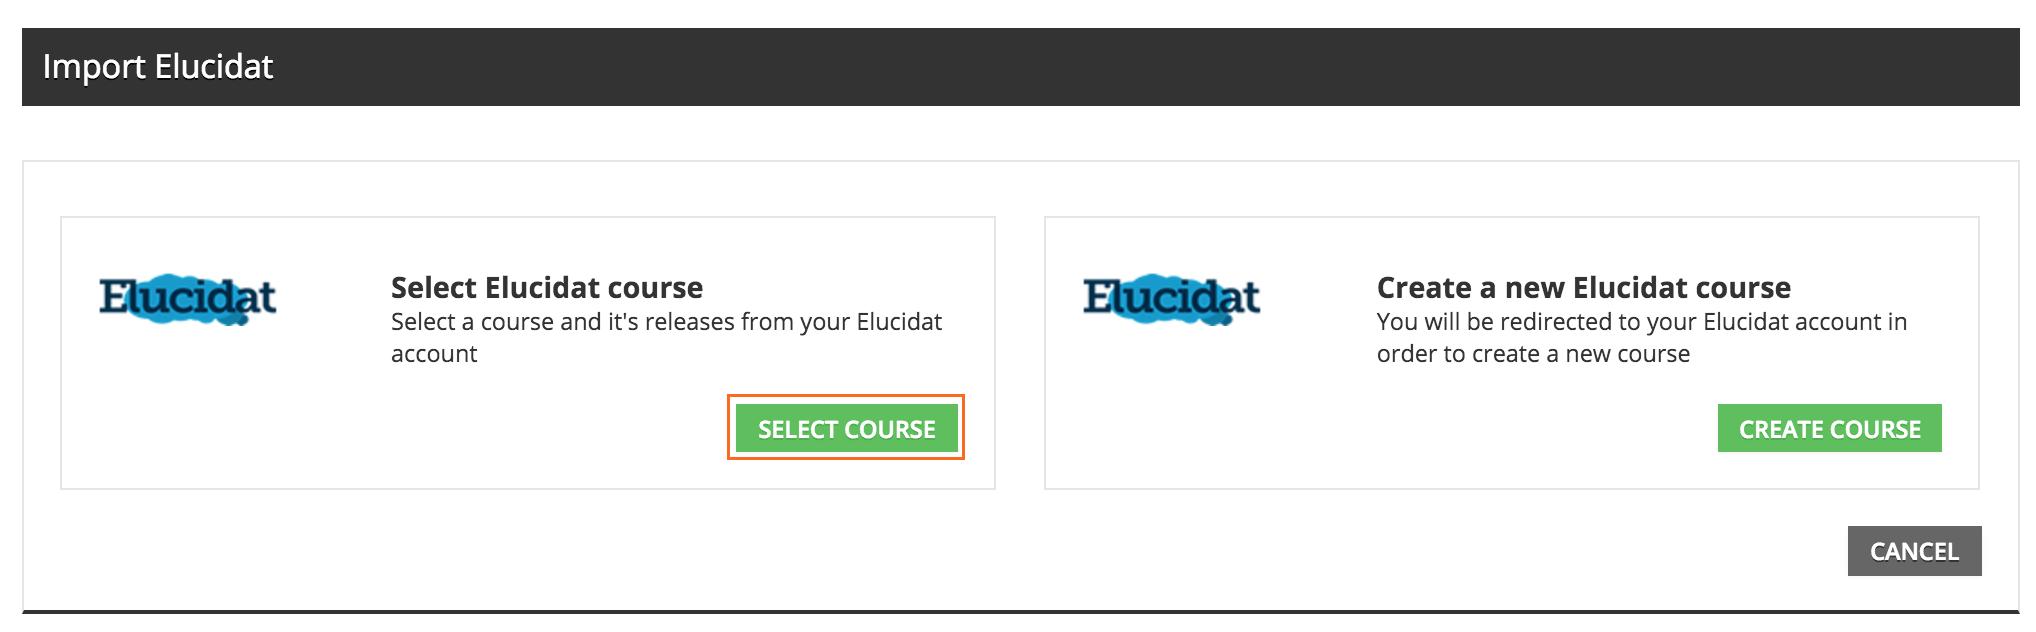 elucidat Select course